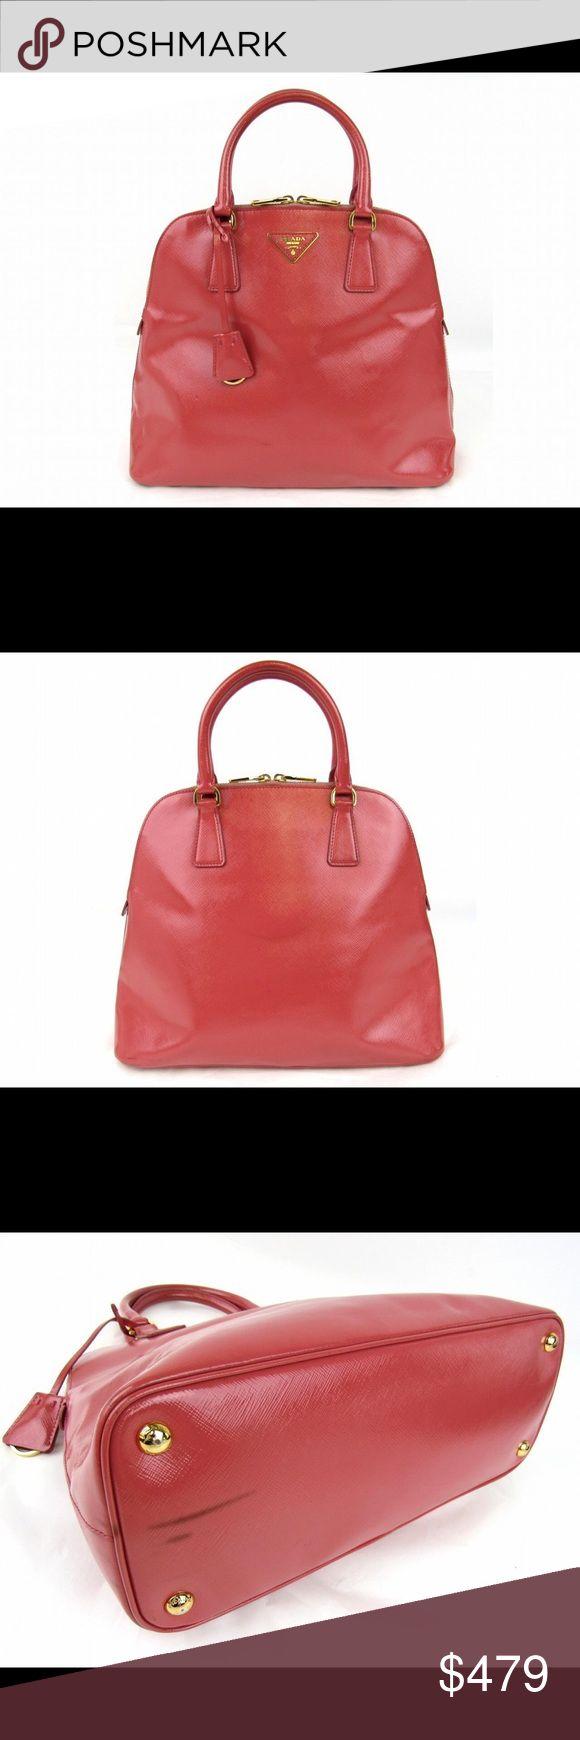 "Authentic PRADA Handbag Tote Bag Saffiano Leather Brand NamePRADA  Item NameHandbag  ColorPink  MaterialSaffiano Leather  SizeW33 x H27 x D13cm(W12.9"" x H10.6"" x D5.1"")     Handle:32cm(12.5"")Strap drop:10cm(3.9"")  Pocket>Inside/Open x 3/Zipper x 1  Some noticeable wrinkles/Metal part has a few noticeable scratches  Metal part has a few noticeable stains  Edges/RimSome noticeable scratched  Signs of wearSigns of wear prada Bags Totes"